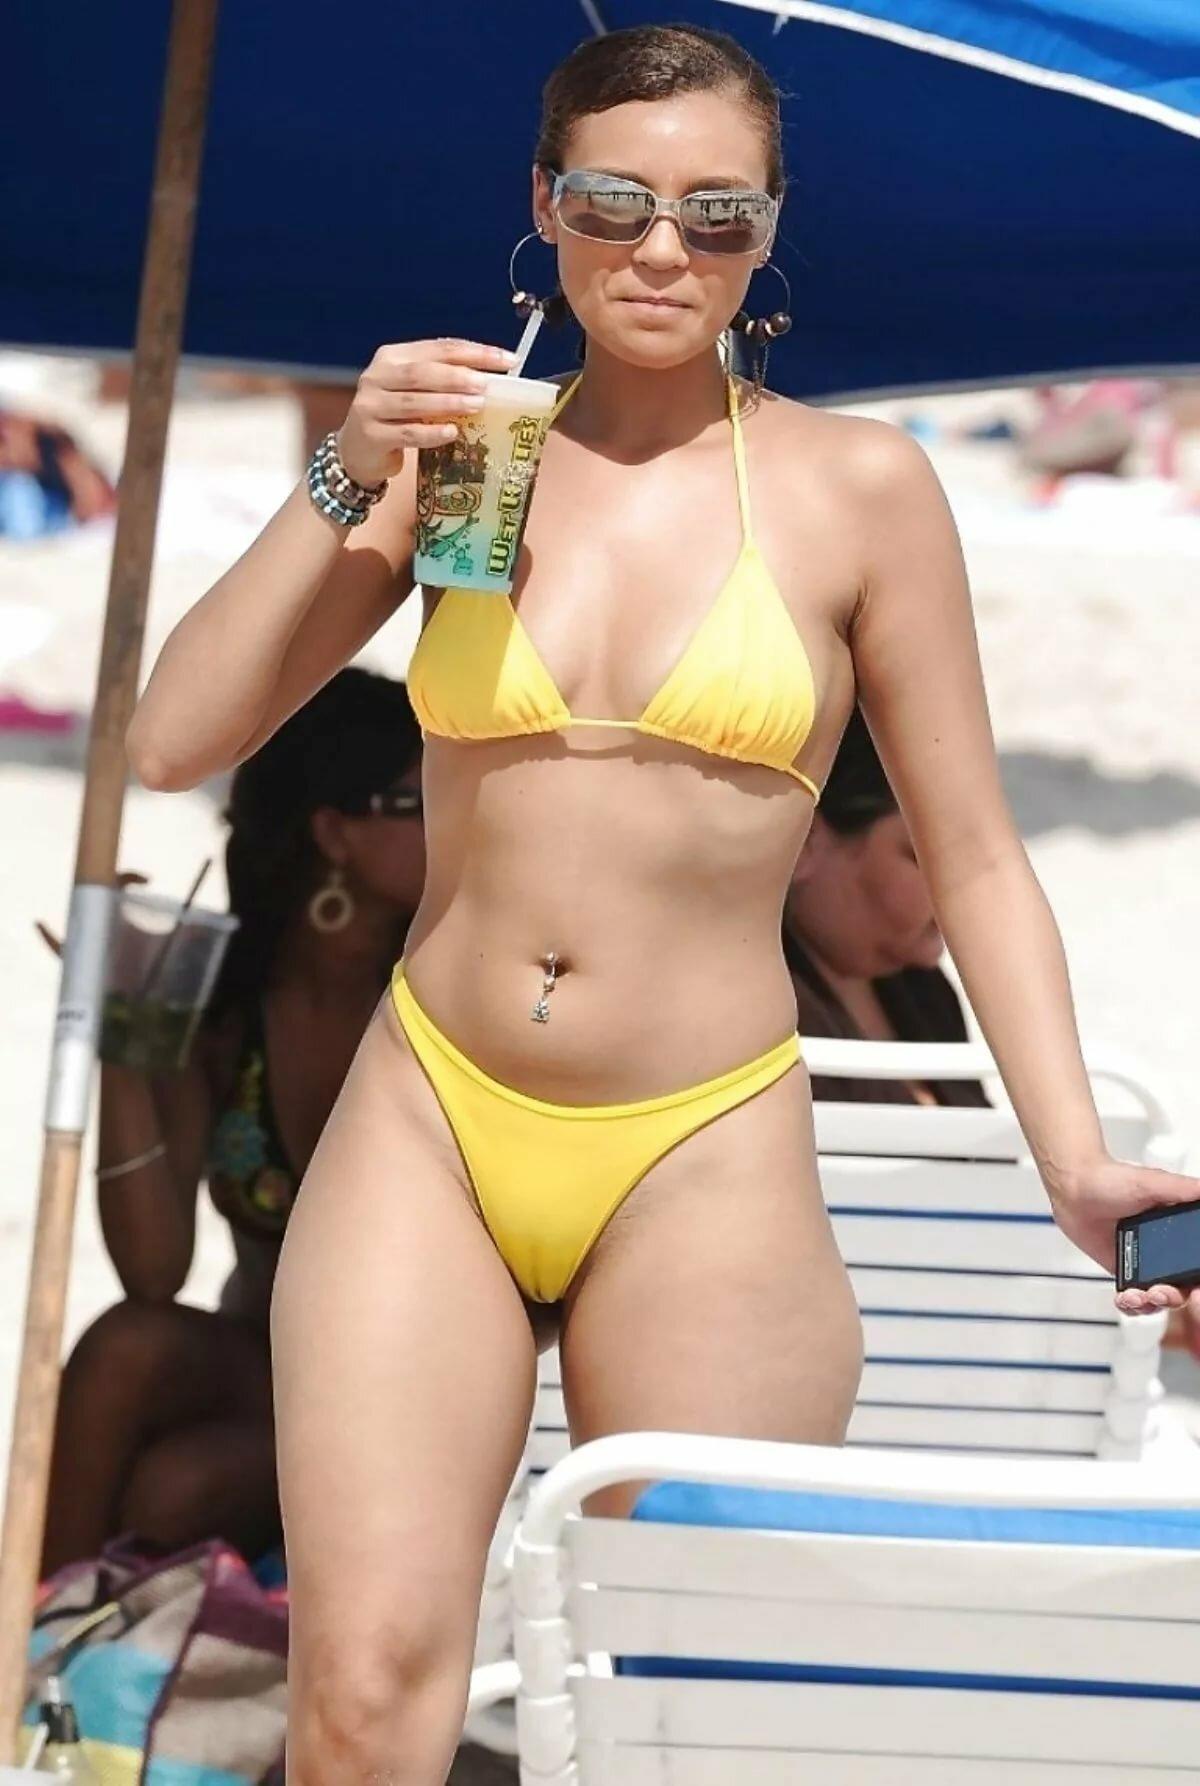 Malaya pussy girl pics, mexican nude big butt